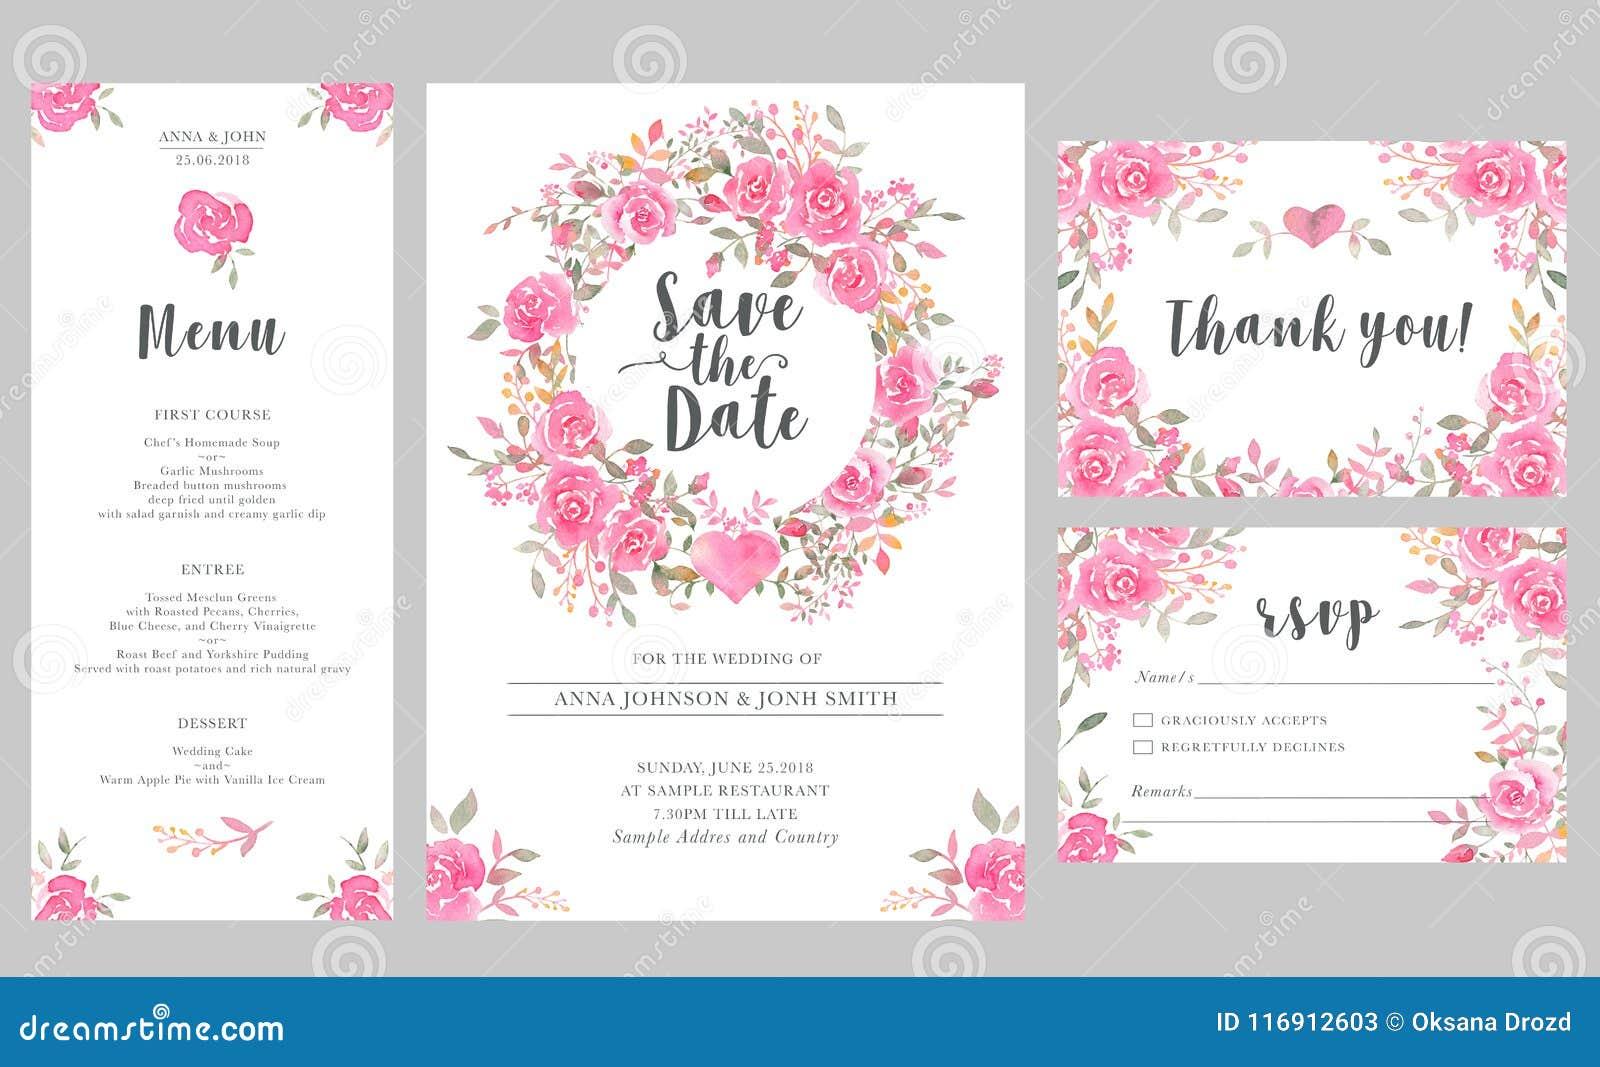 Set of wedding invitation card templates with watercolor rose download set of wedding invitation card templates with watercolor rose flowers stock illustration illustration stopboris Choice Image